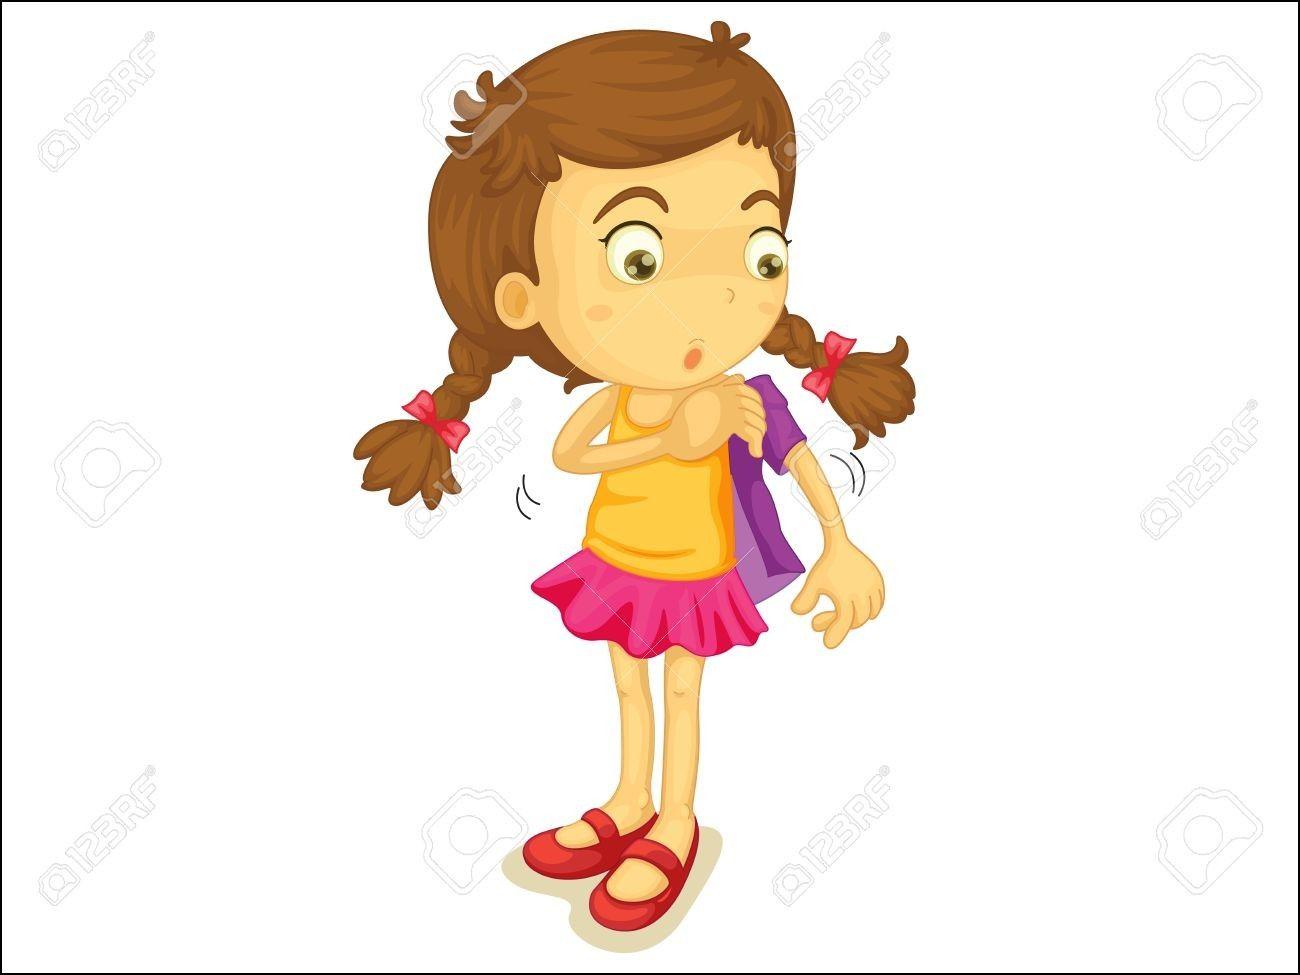 jpg transparent Getting dressed clipart. Girl kids vector clip.